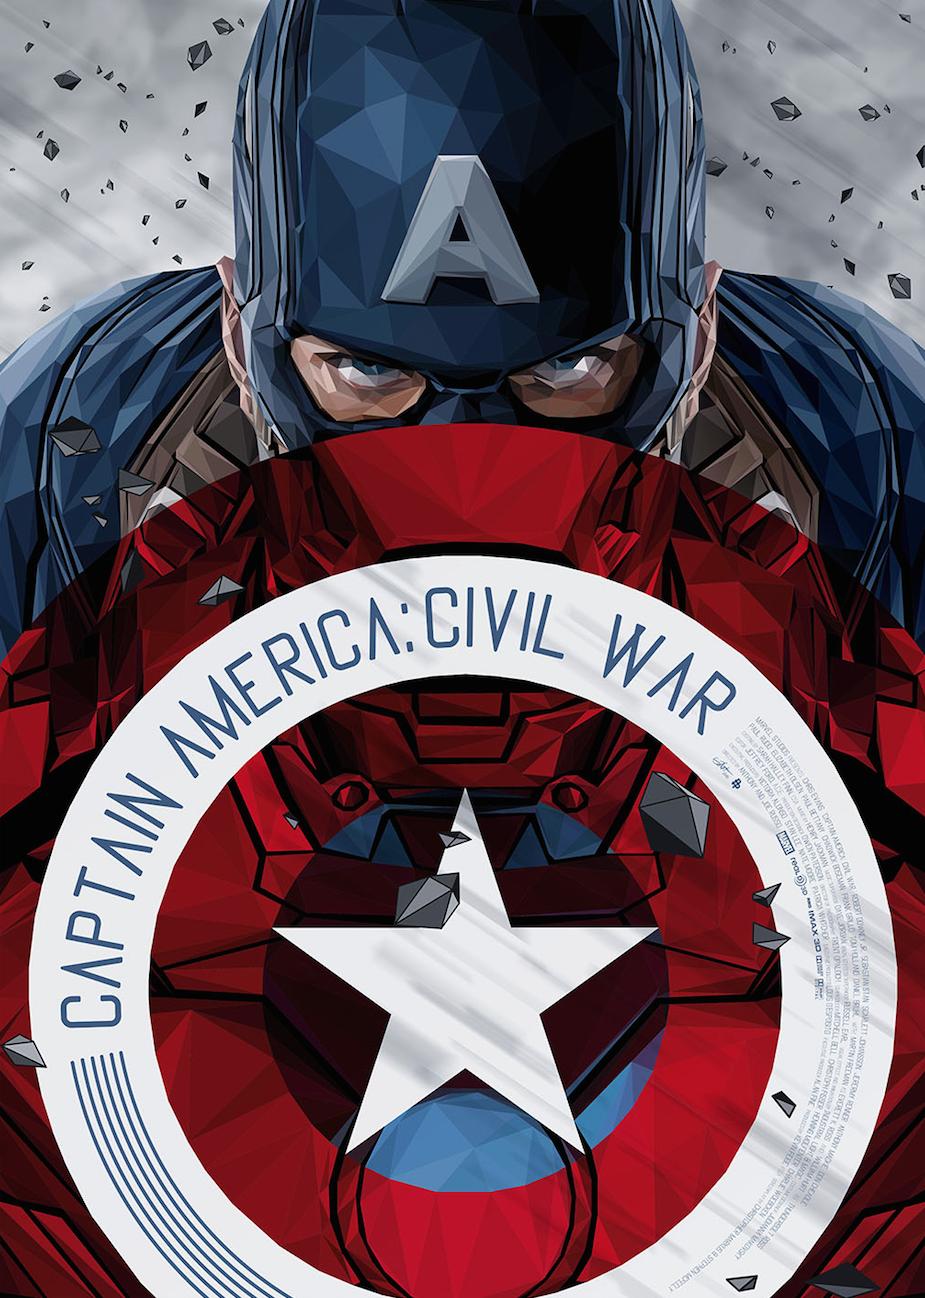 Capitão América: Guerra Civil. | Naruto | Pinterest | Capitán ...